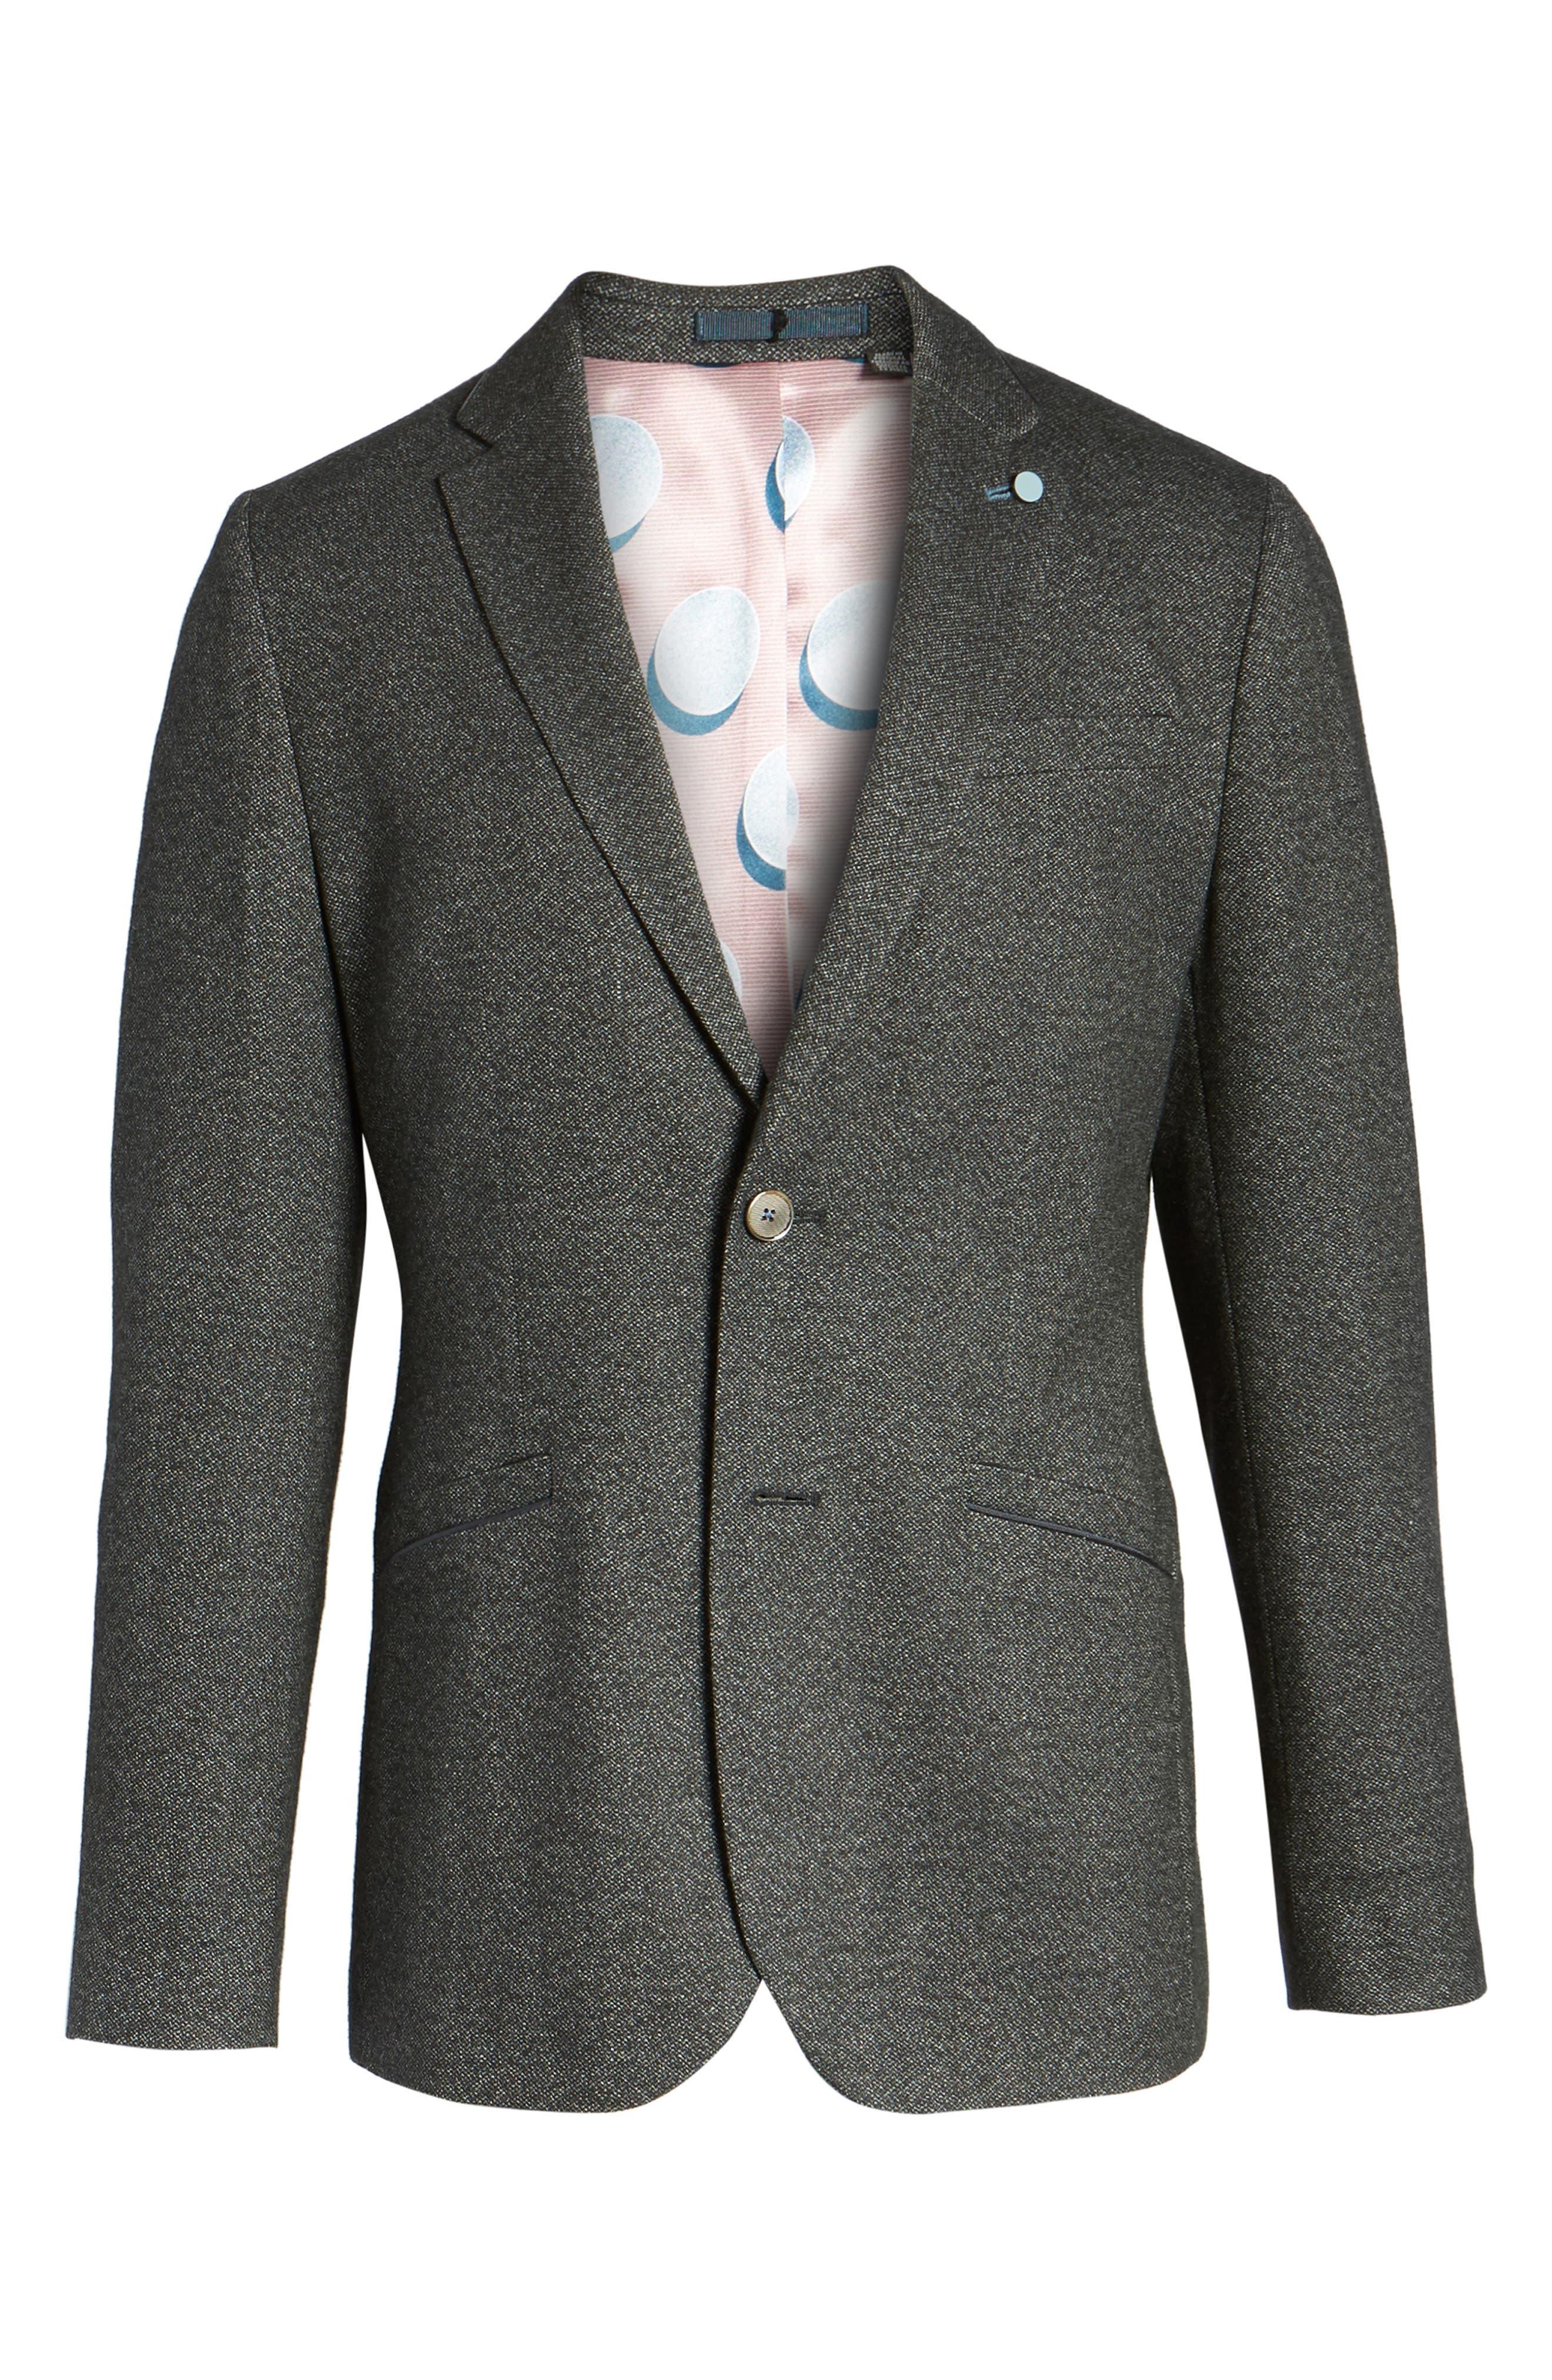 Beektt Semi Plain Trim Fit Jacket,                             Alternate thumbnail 6, color,                             Charcoal